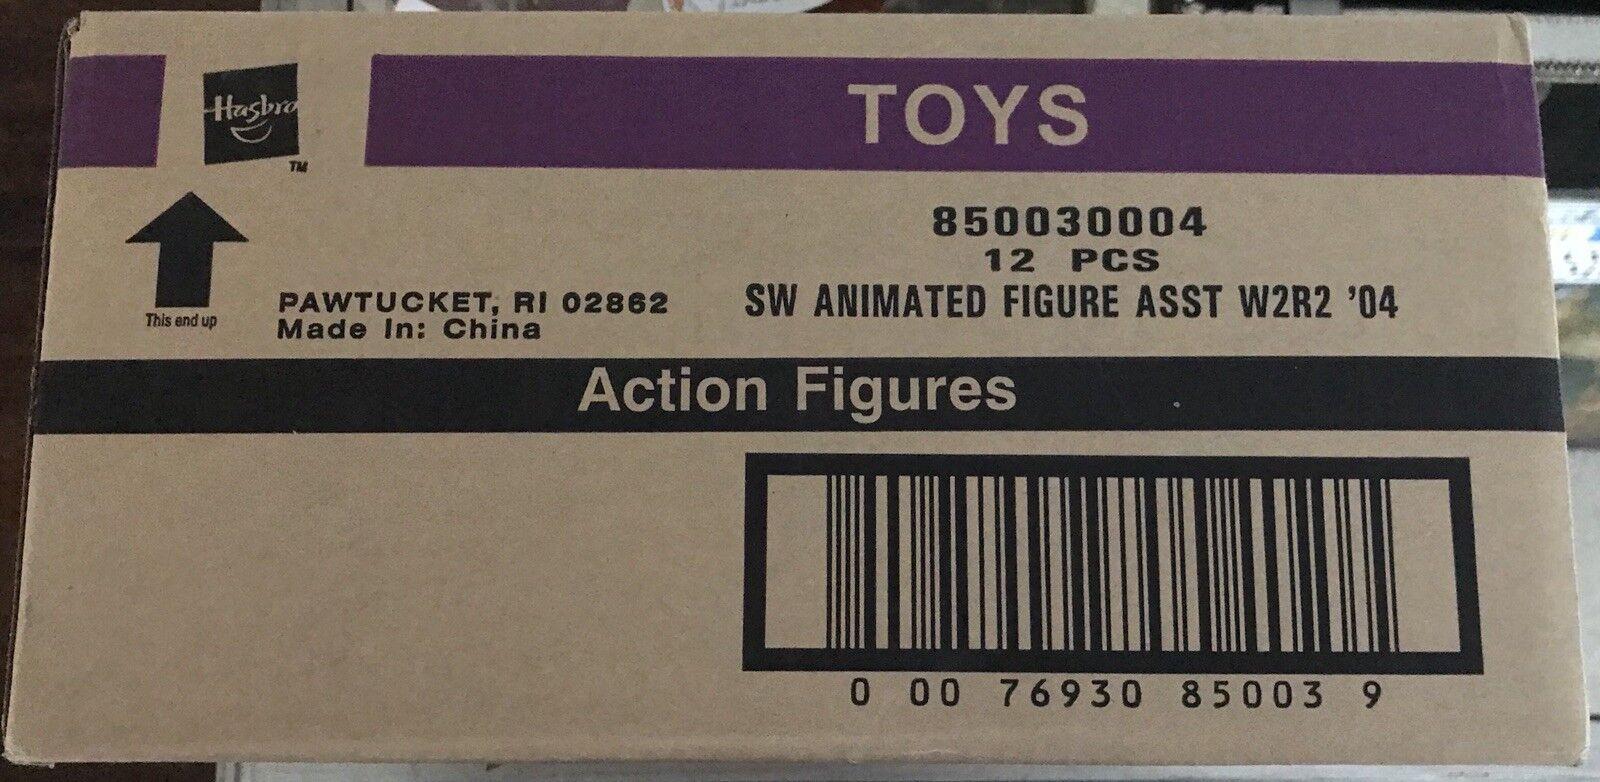 Clone Wars Animerad stjärnornas krig Case 12 PC 850030004 Action Figur